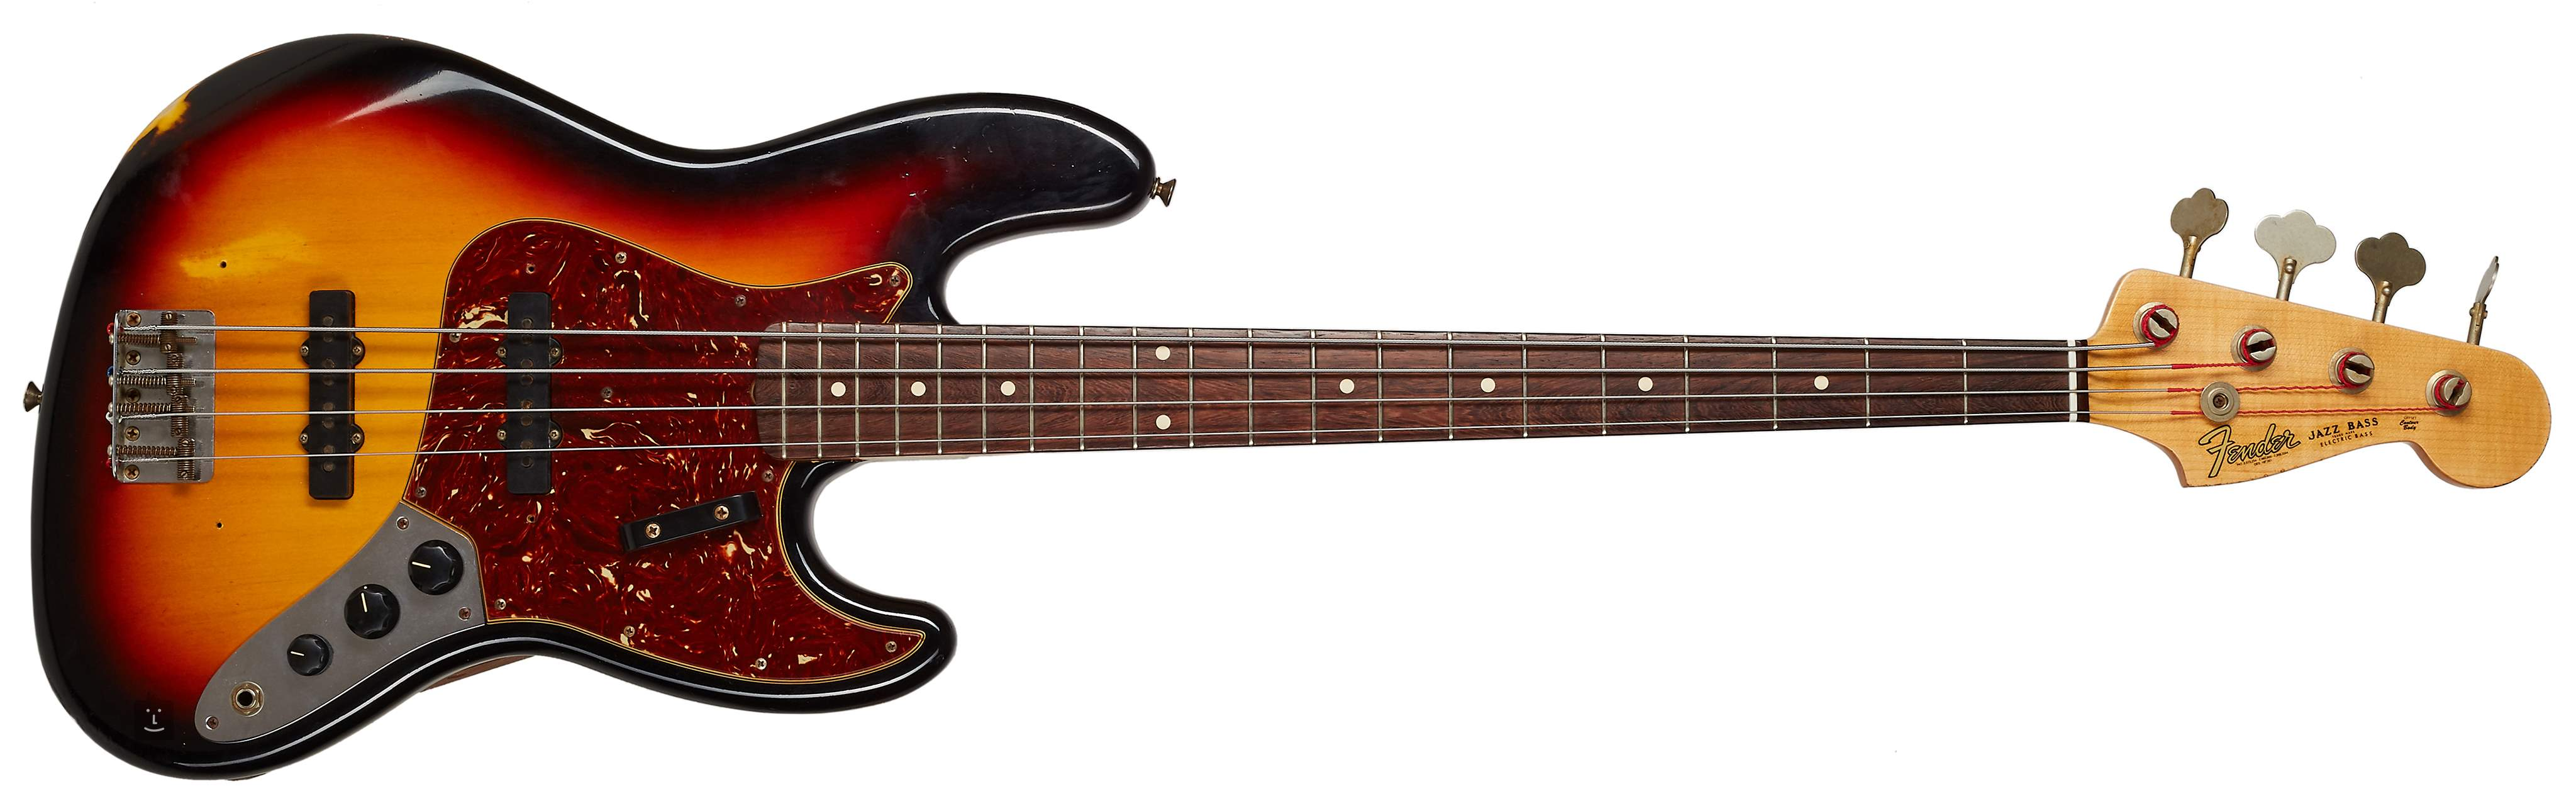 Kytary co uk - FENDER 2011 Custom Shop ´64 Jazz Bass Time Machine Series  Mint! Electric Bass Guitar